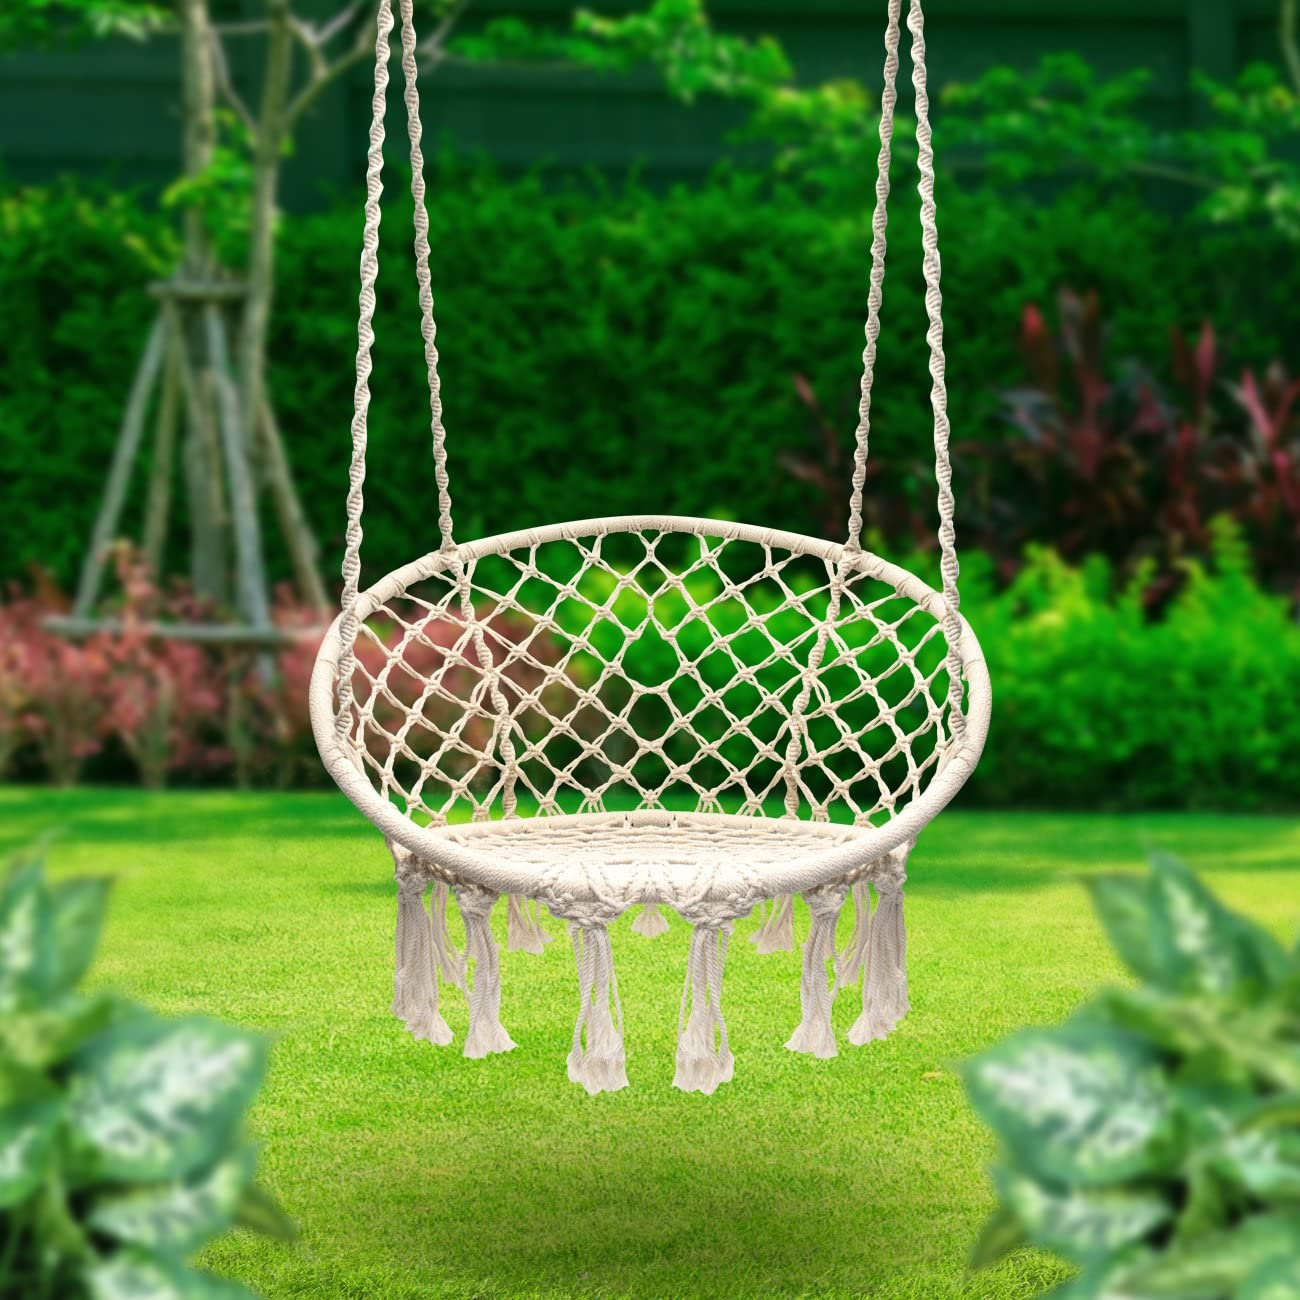 Sorbus-Hammock-Macrame 15 Unique Furniture Designs for Outdoor Small Spaces